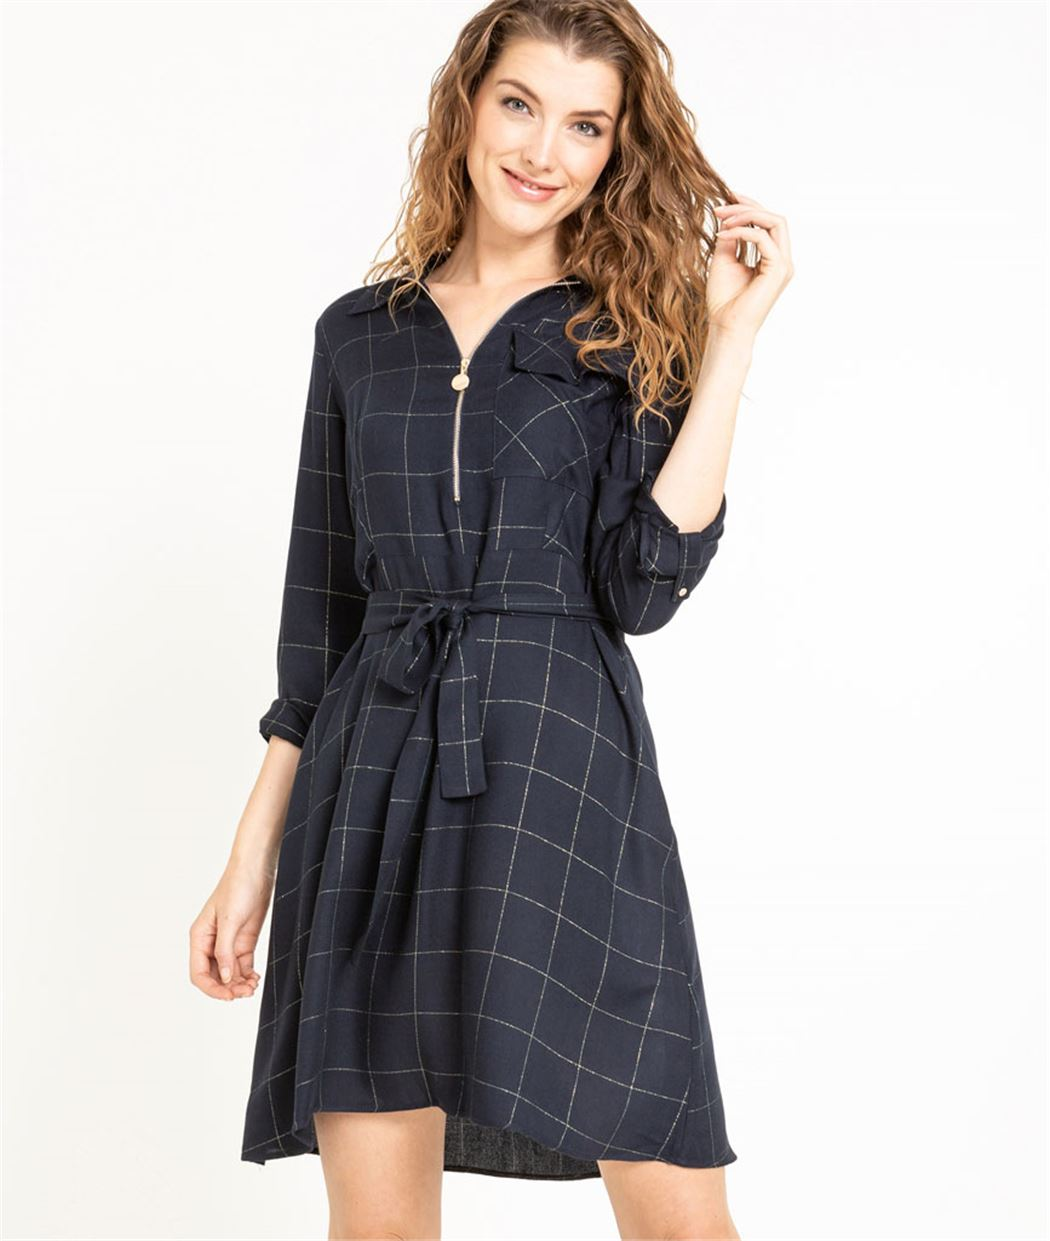 Robe chemise femme à carreaux MARINE